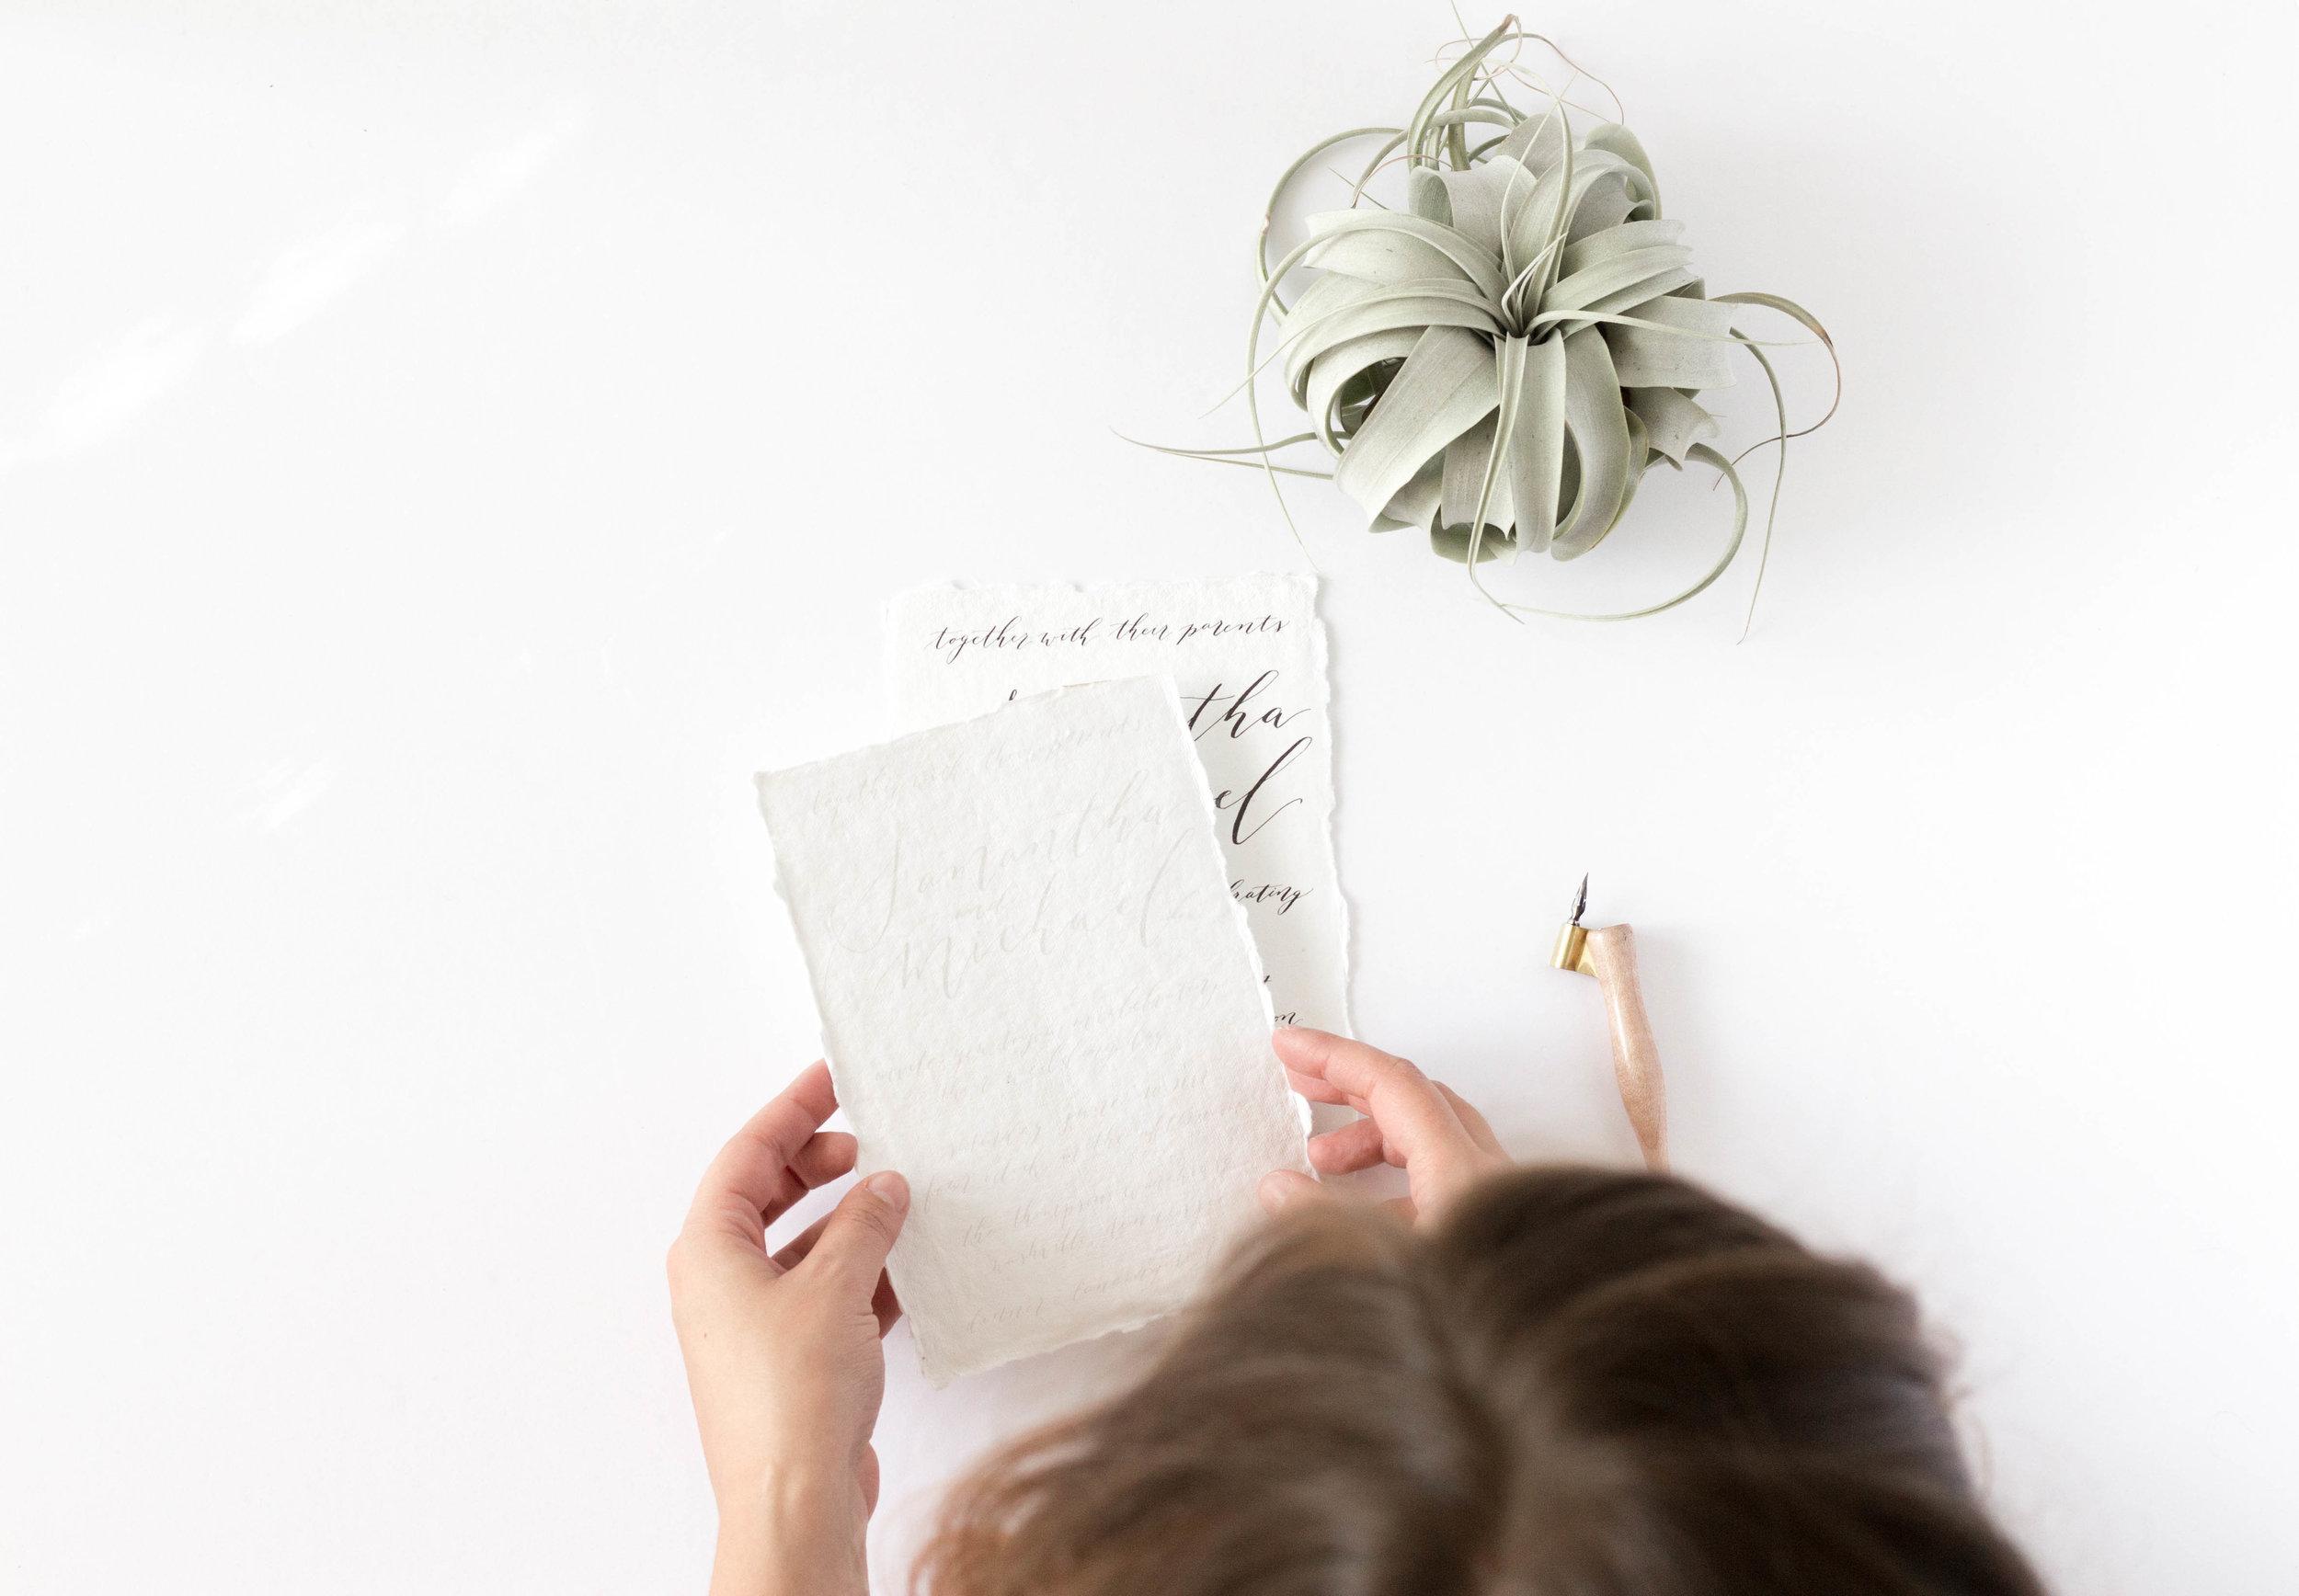 Simple Minimalist Wedding Invitations - Handmade Paper - Modern Calligraphy - True North Paper Co